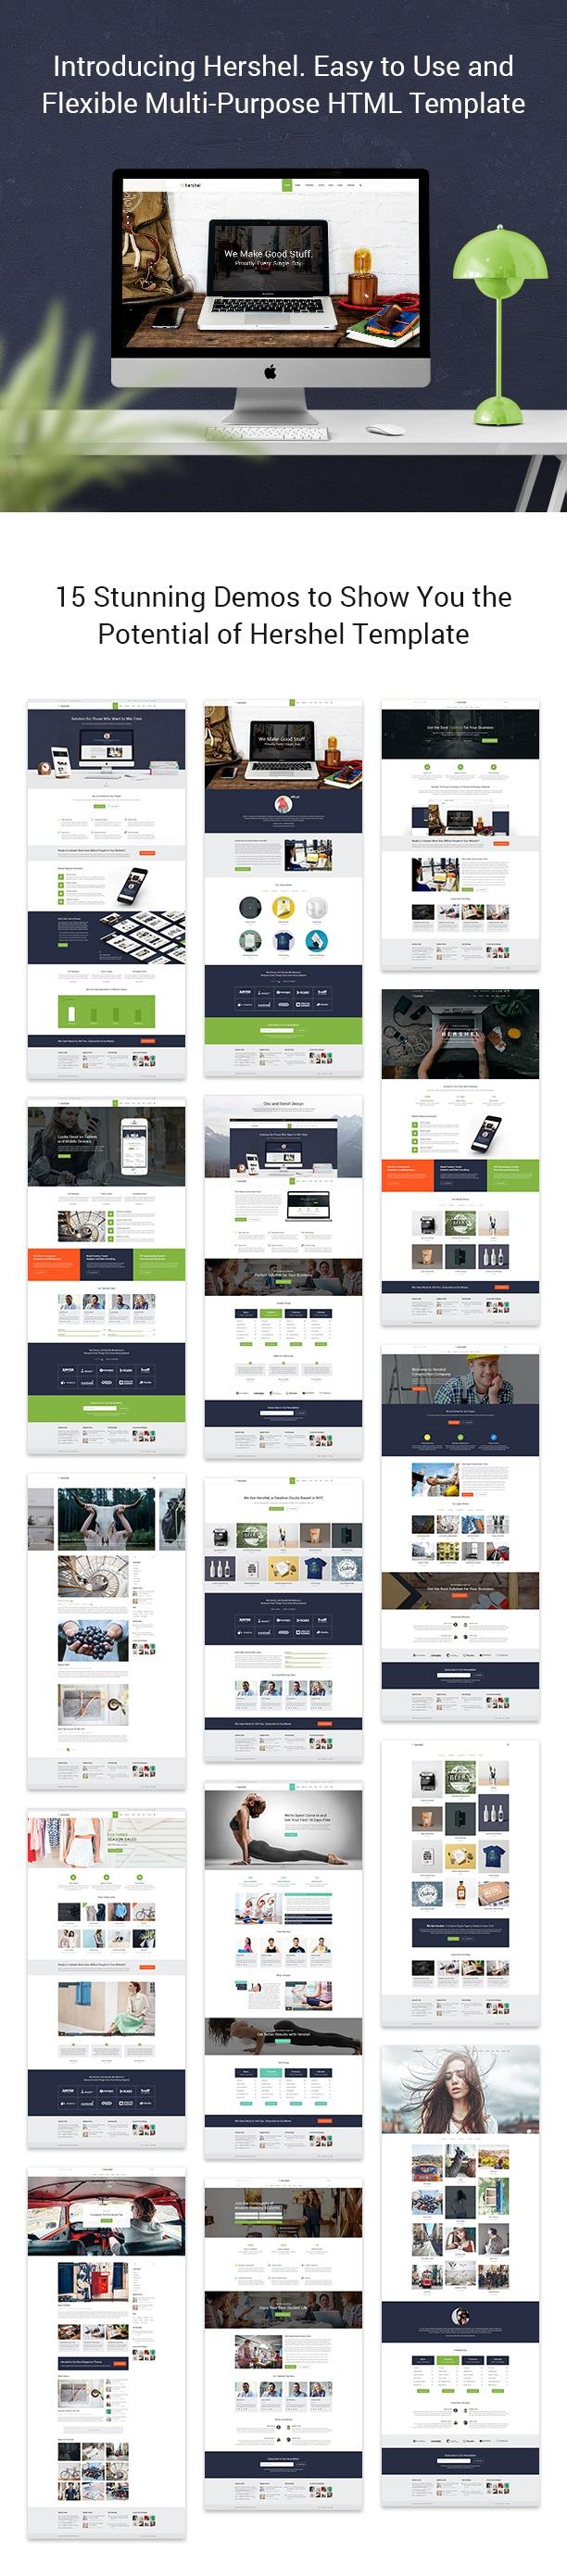 Hershel - Flexible Multipurpose HTML Template - 3